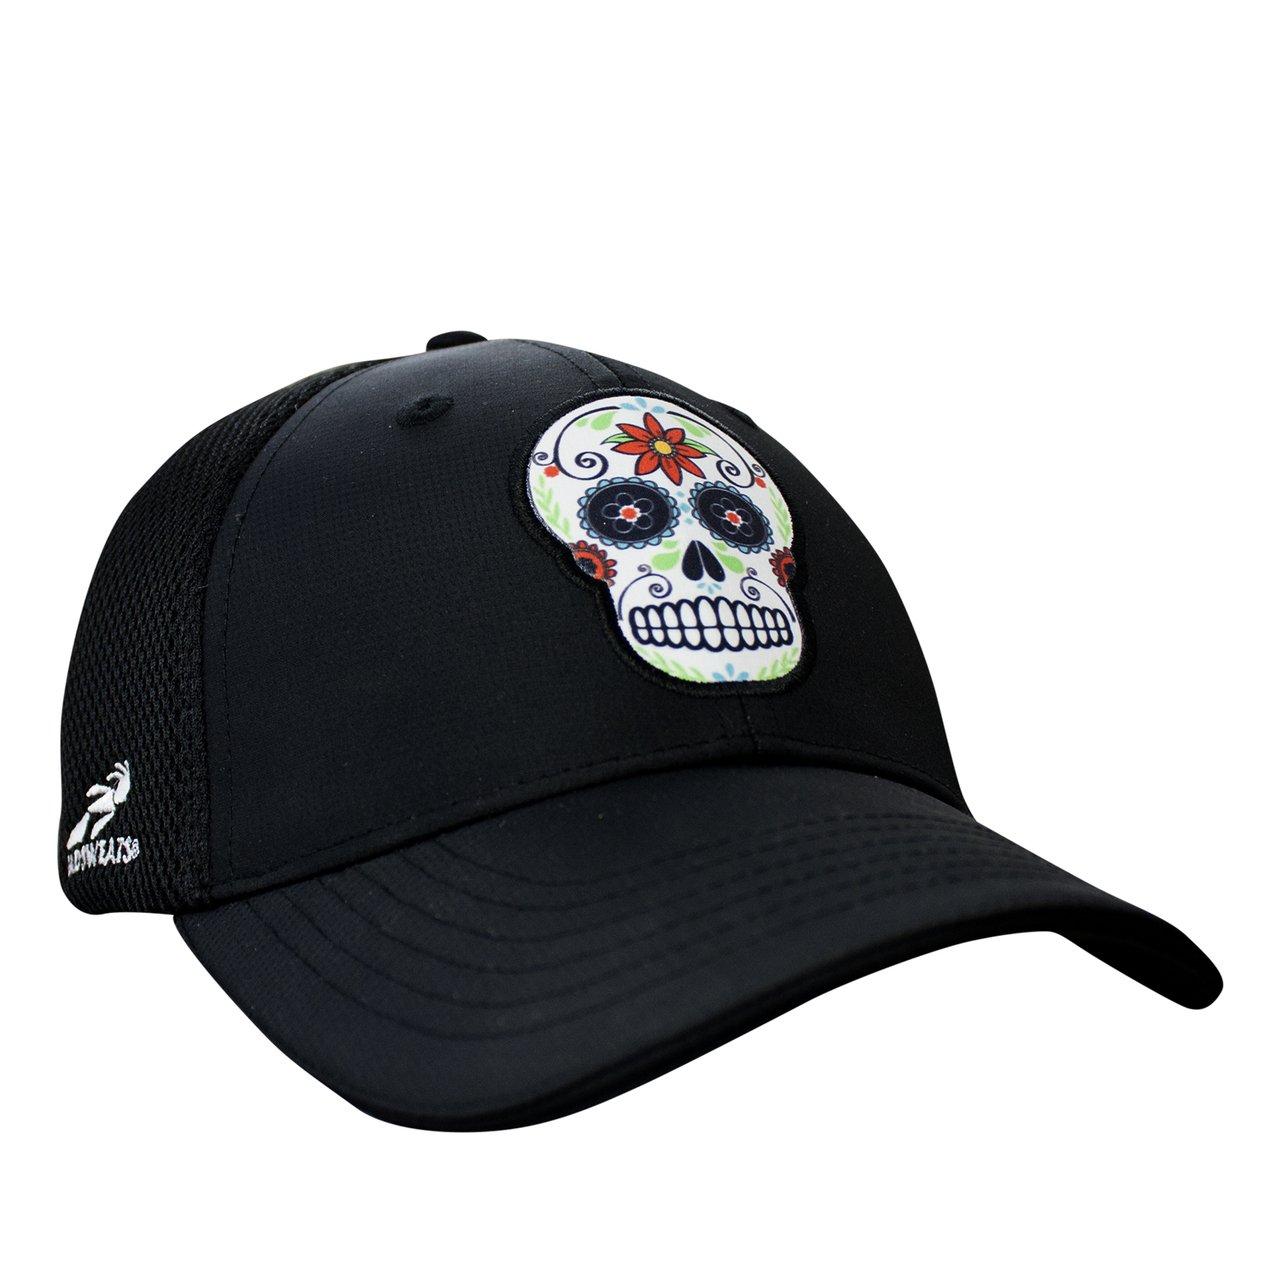 Sugar Skull Dark Ponytail Messy High Bun Hat Ponycaps Baseball Cap Adjustable Trucker Cap Mesh Cap